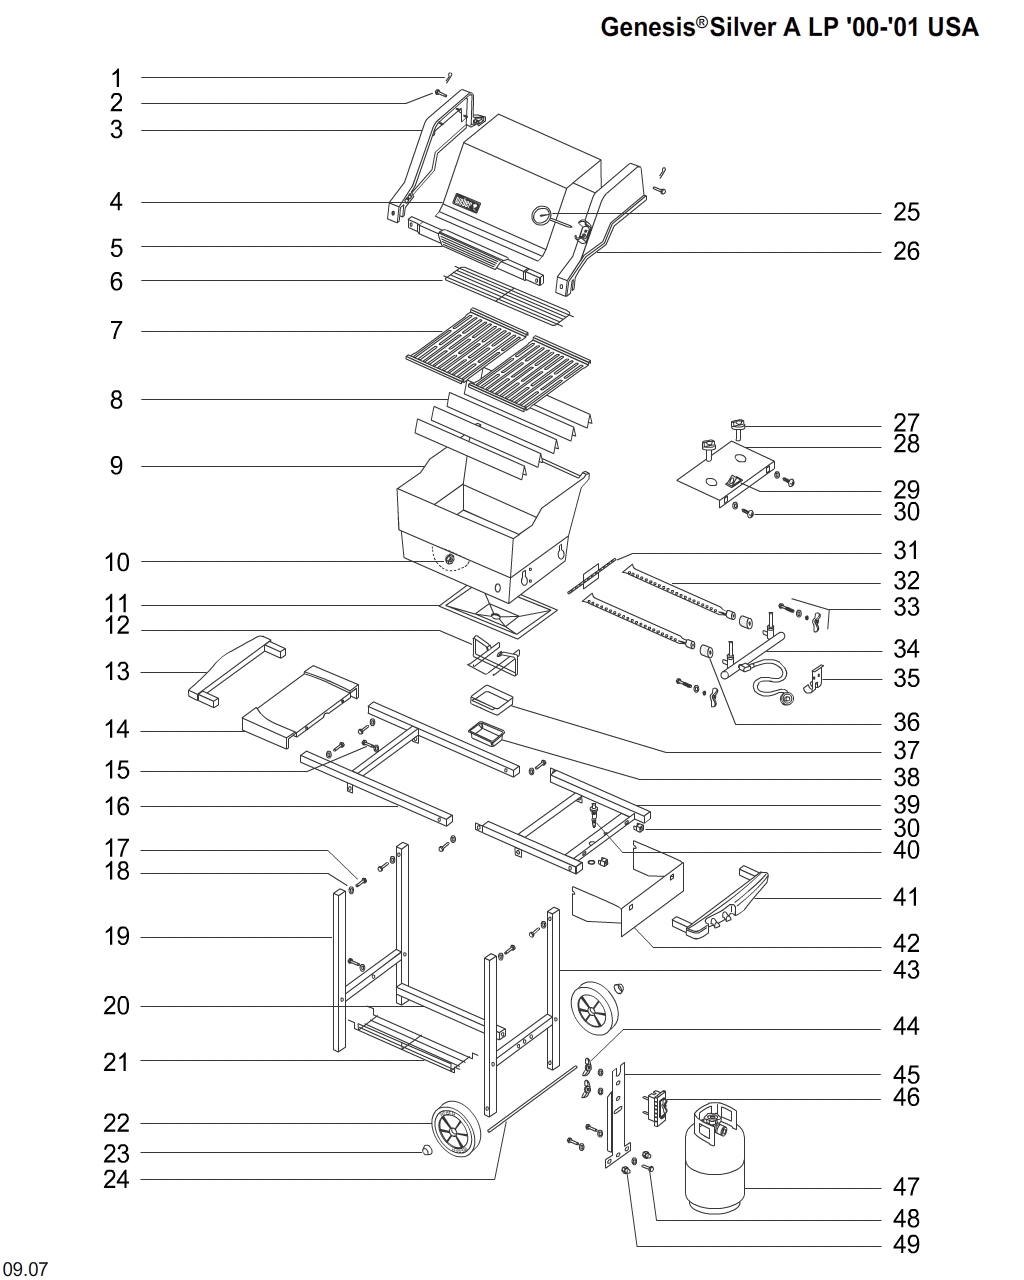 Schematic Image 2241001